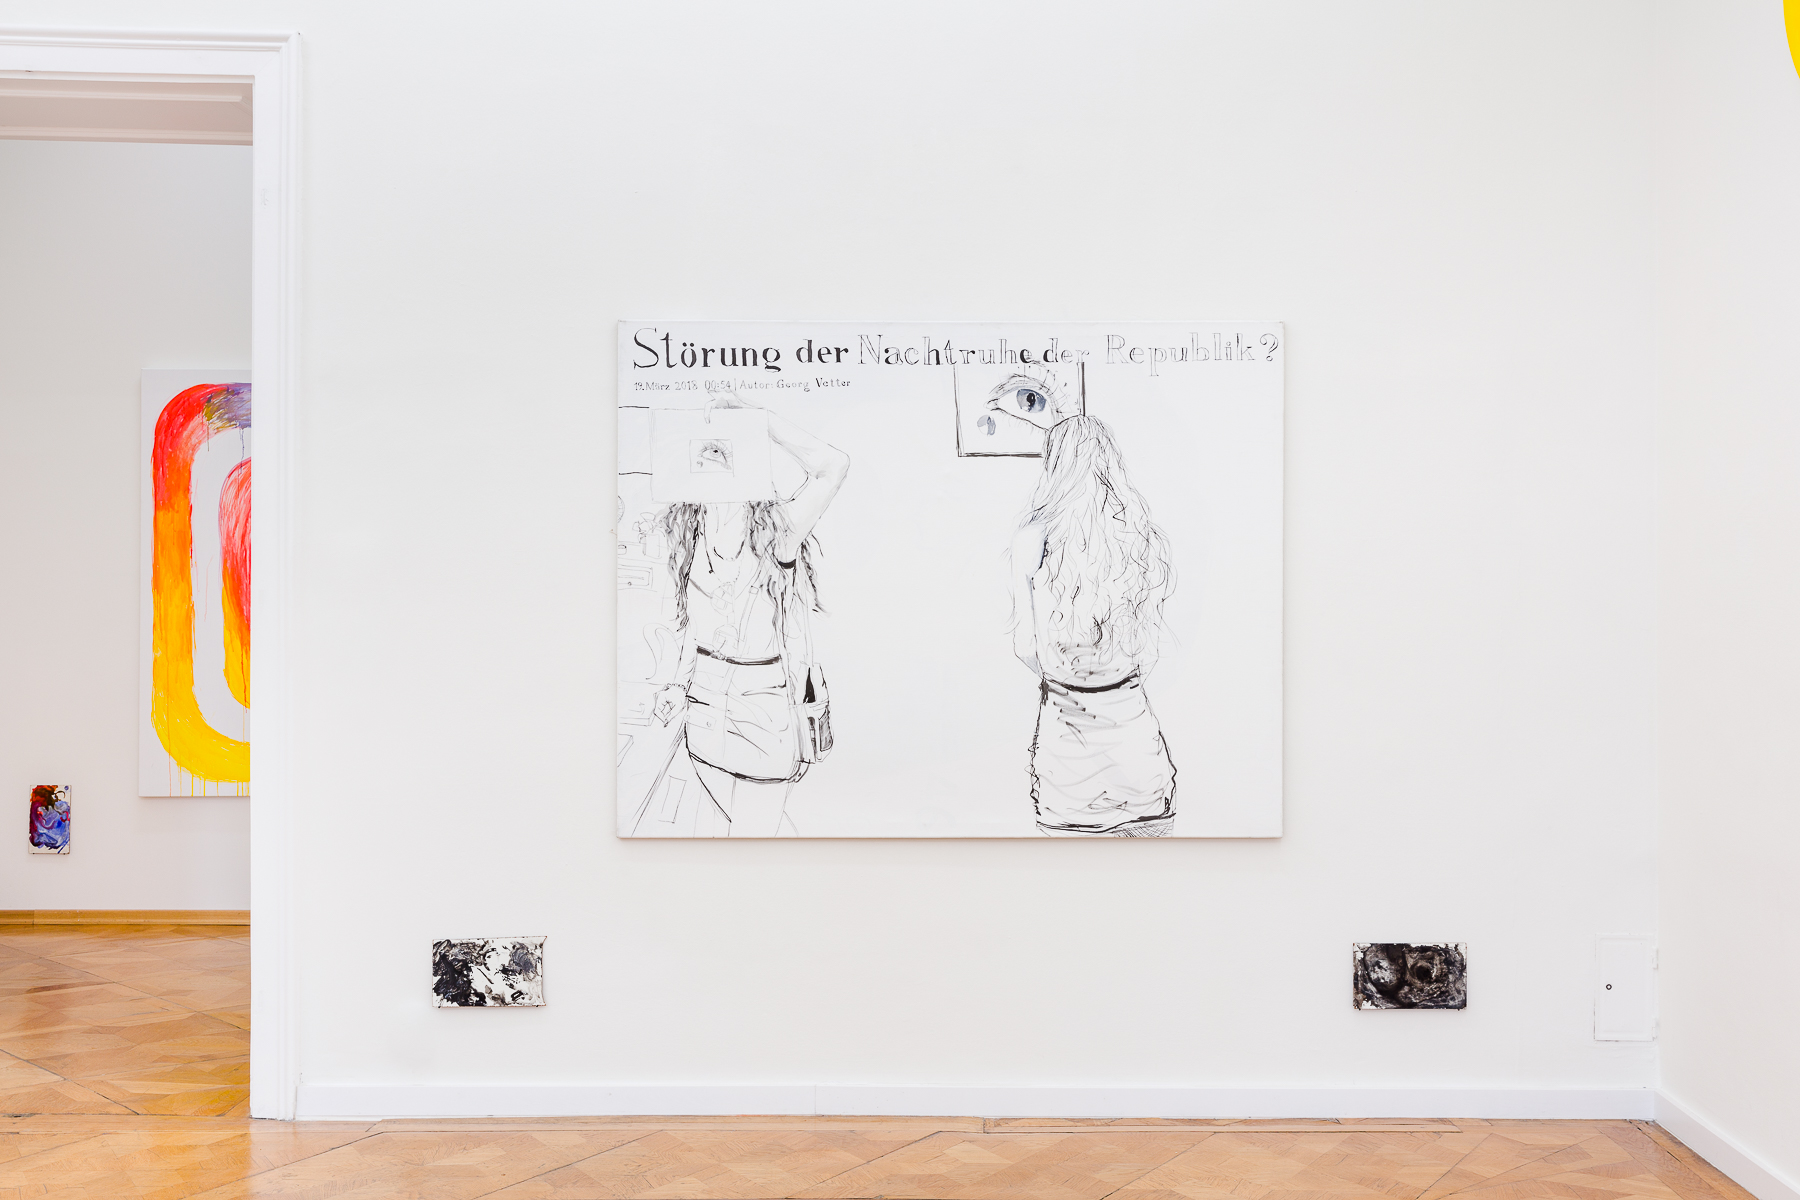 2019_05_20_Elke-Krystufek_Croy-Nielsen_by-kunst-dokumentation-com_060_web.jpg